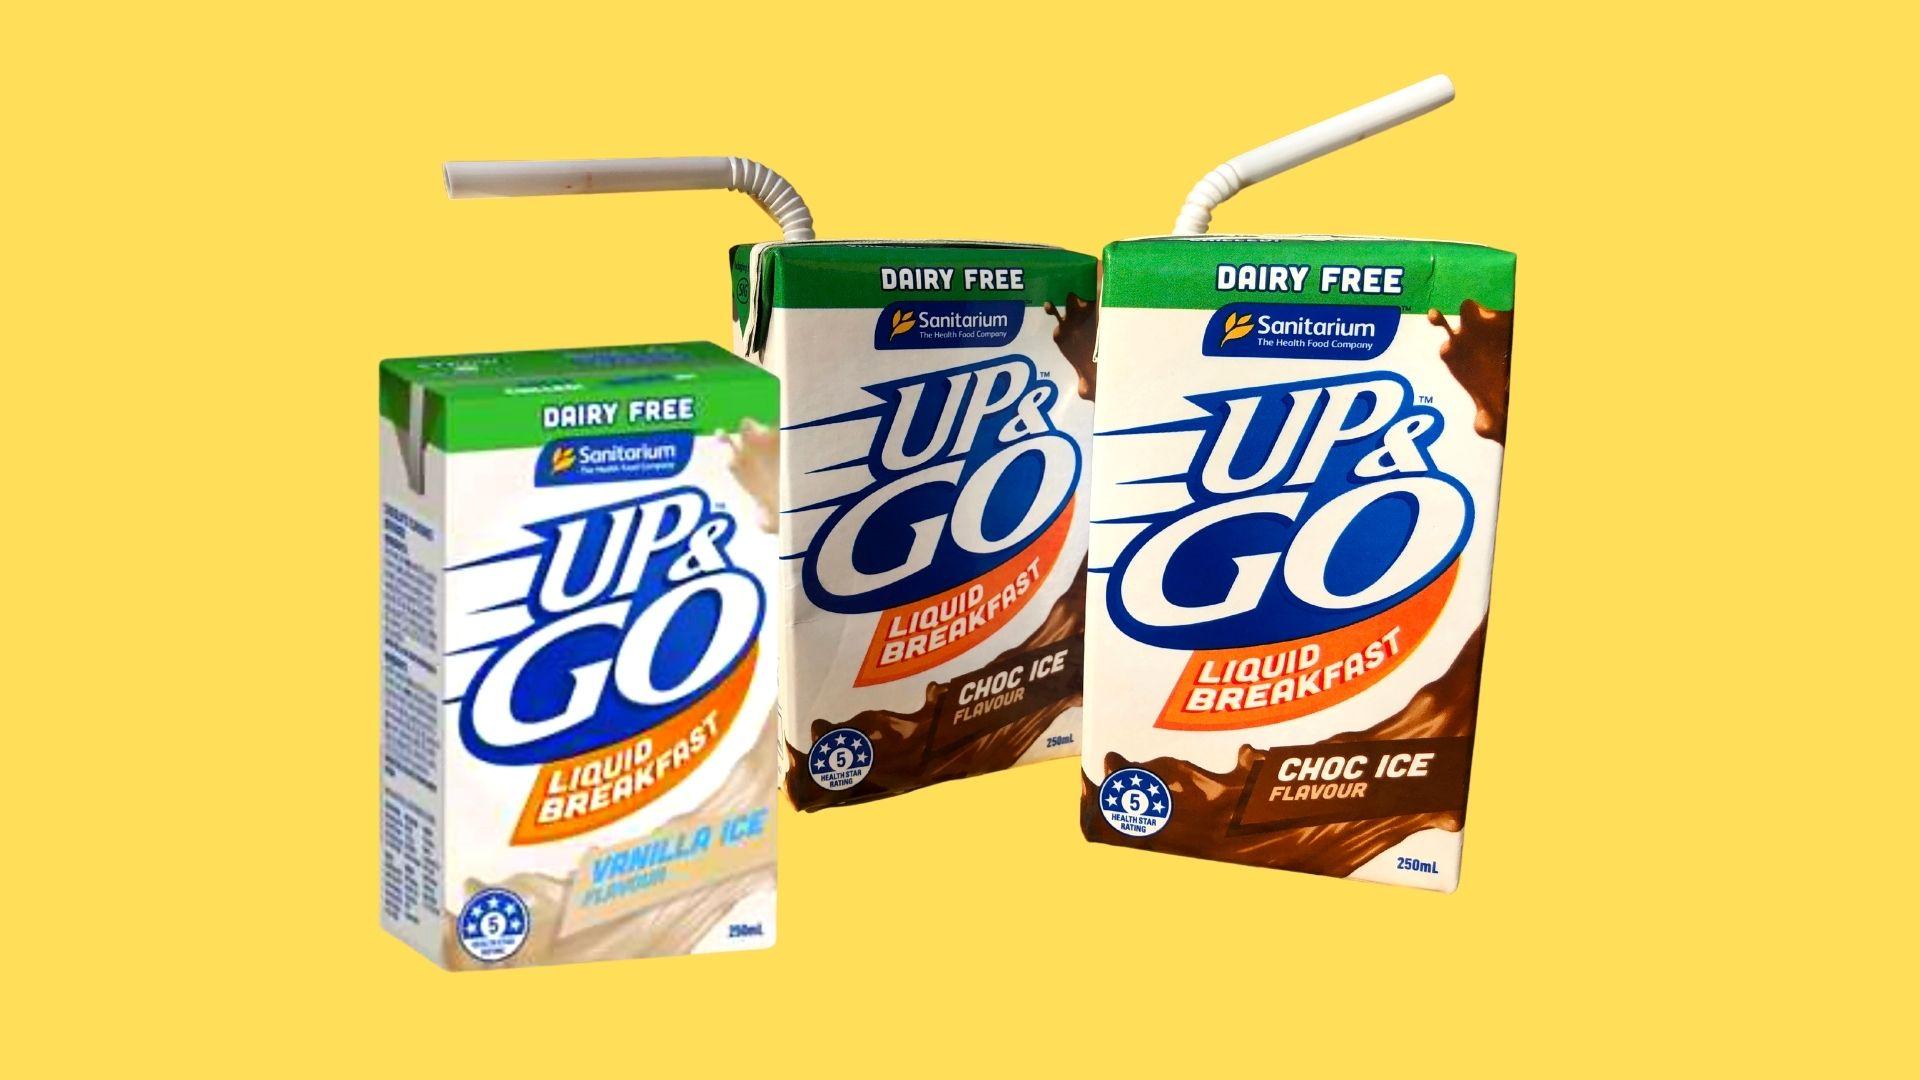 Up & Go Dairy-Free.